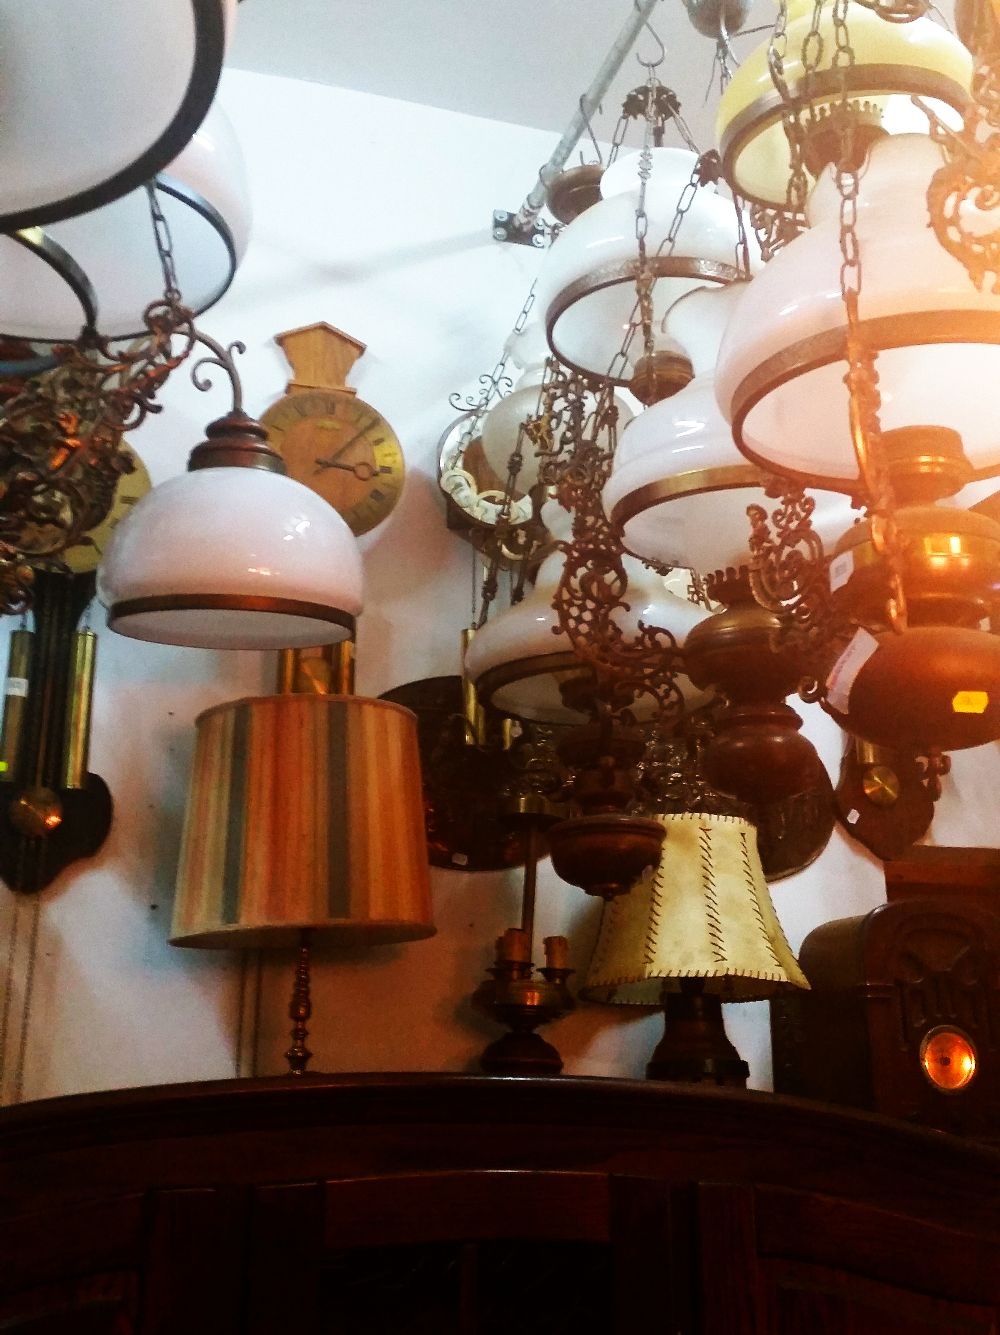 adelaparvu.com despre magazin de mobila si obiecte decorative, magazin antichitati, Leda Decor Bucuresti (6)